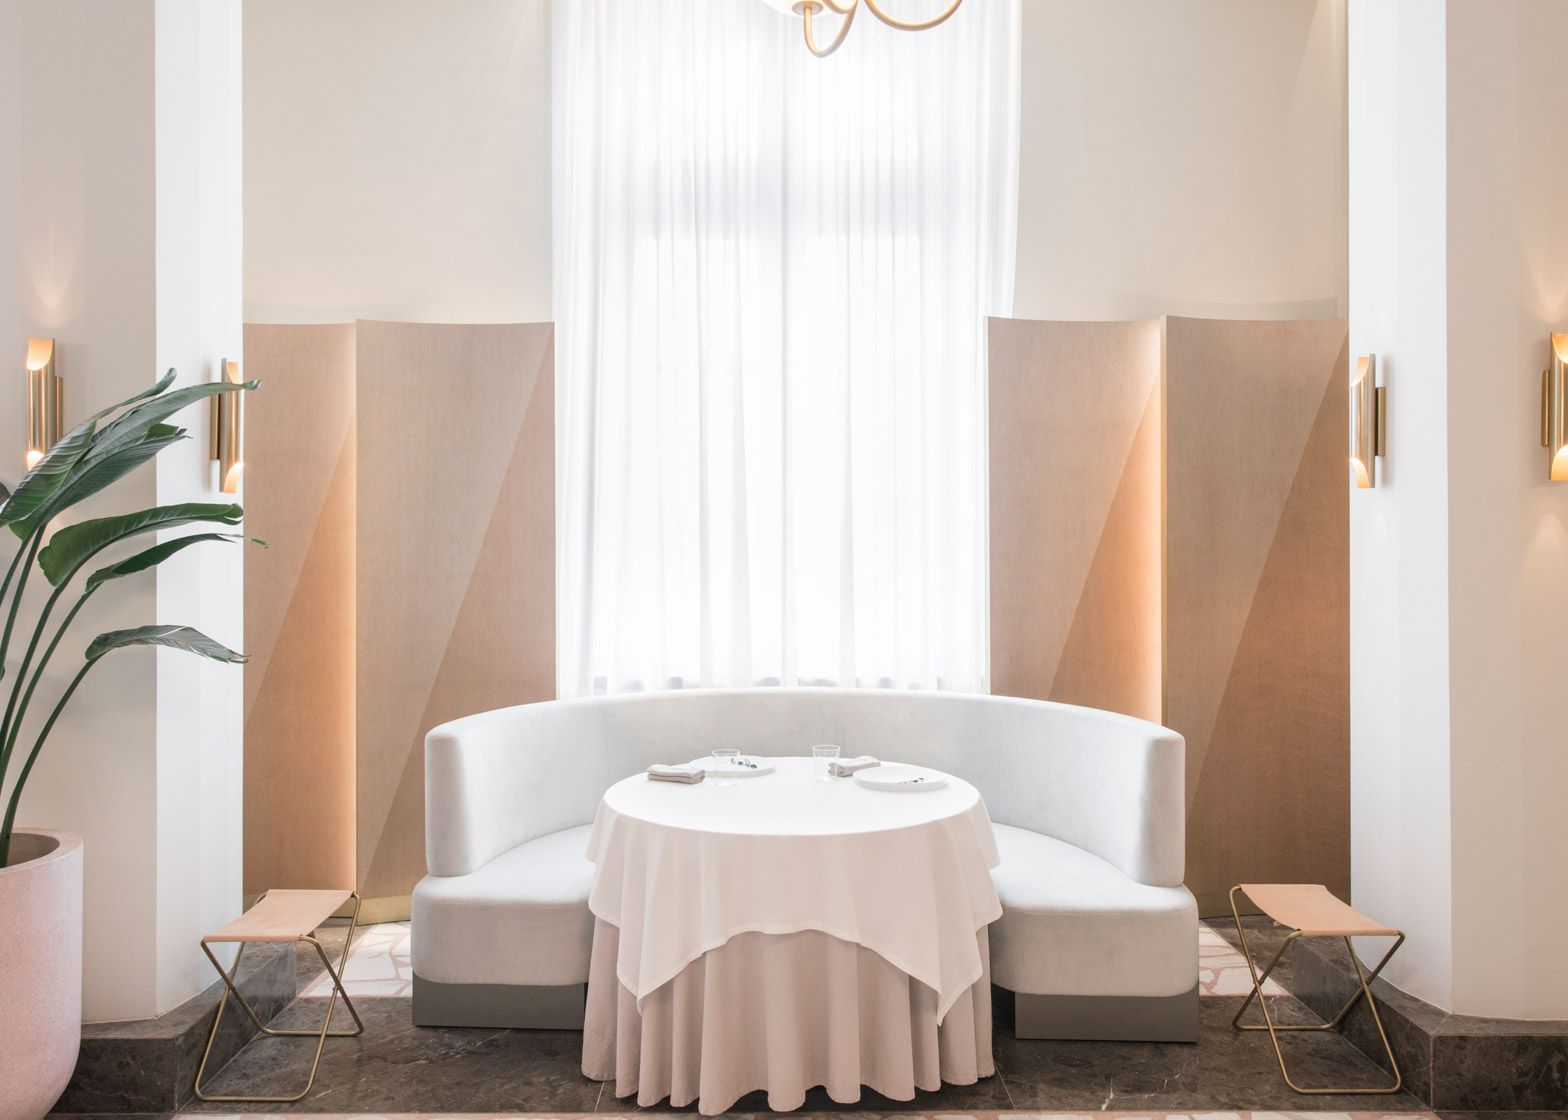 Universal Design Studio creates pink interior for Odette | Dining ...